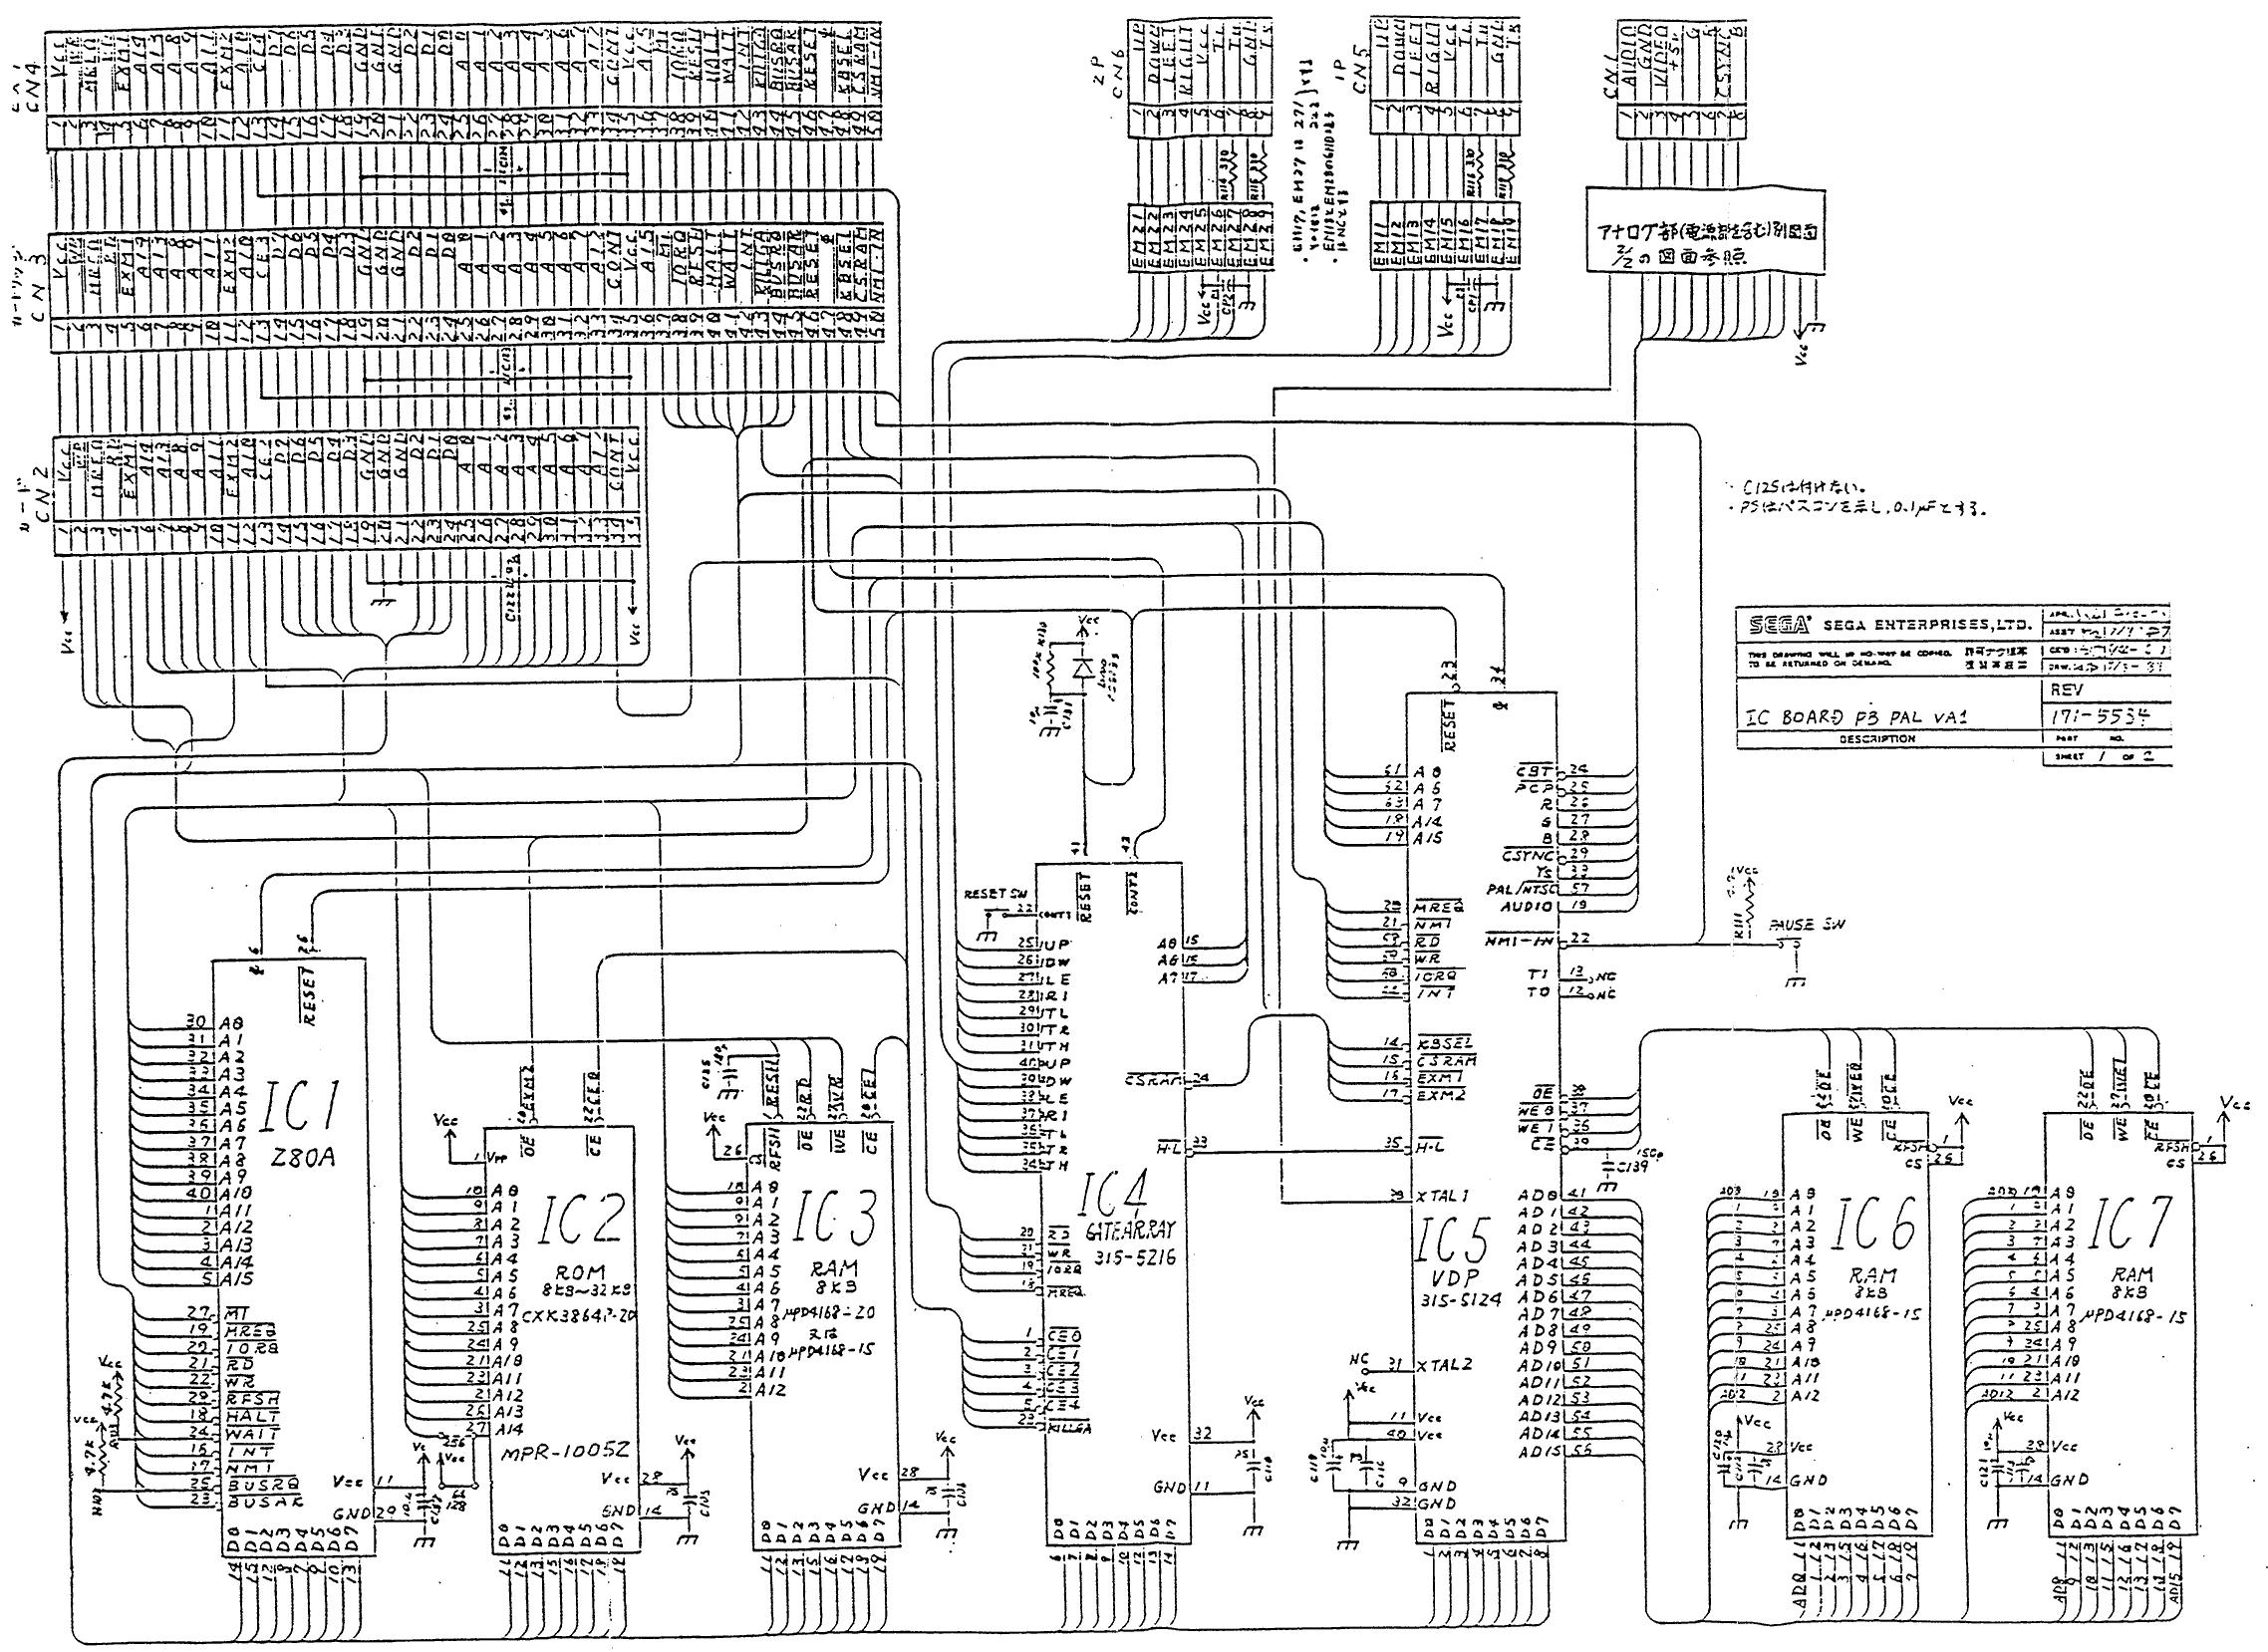 Schematicsconsole Related Schematics Nfg Games Gamesx Playstation 2 Circuit Diagram Sms Schematic Ic Board Pb Pal Va1 171 5534 1 Of